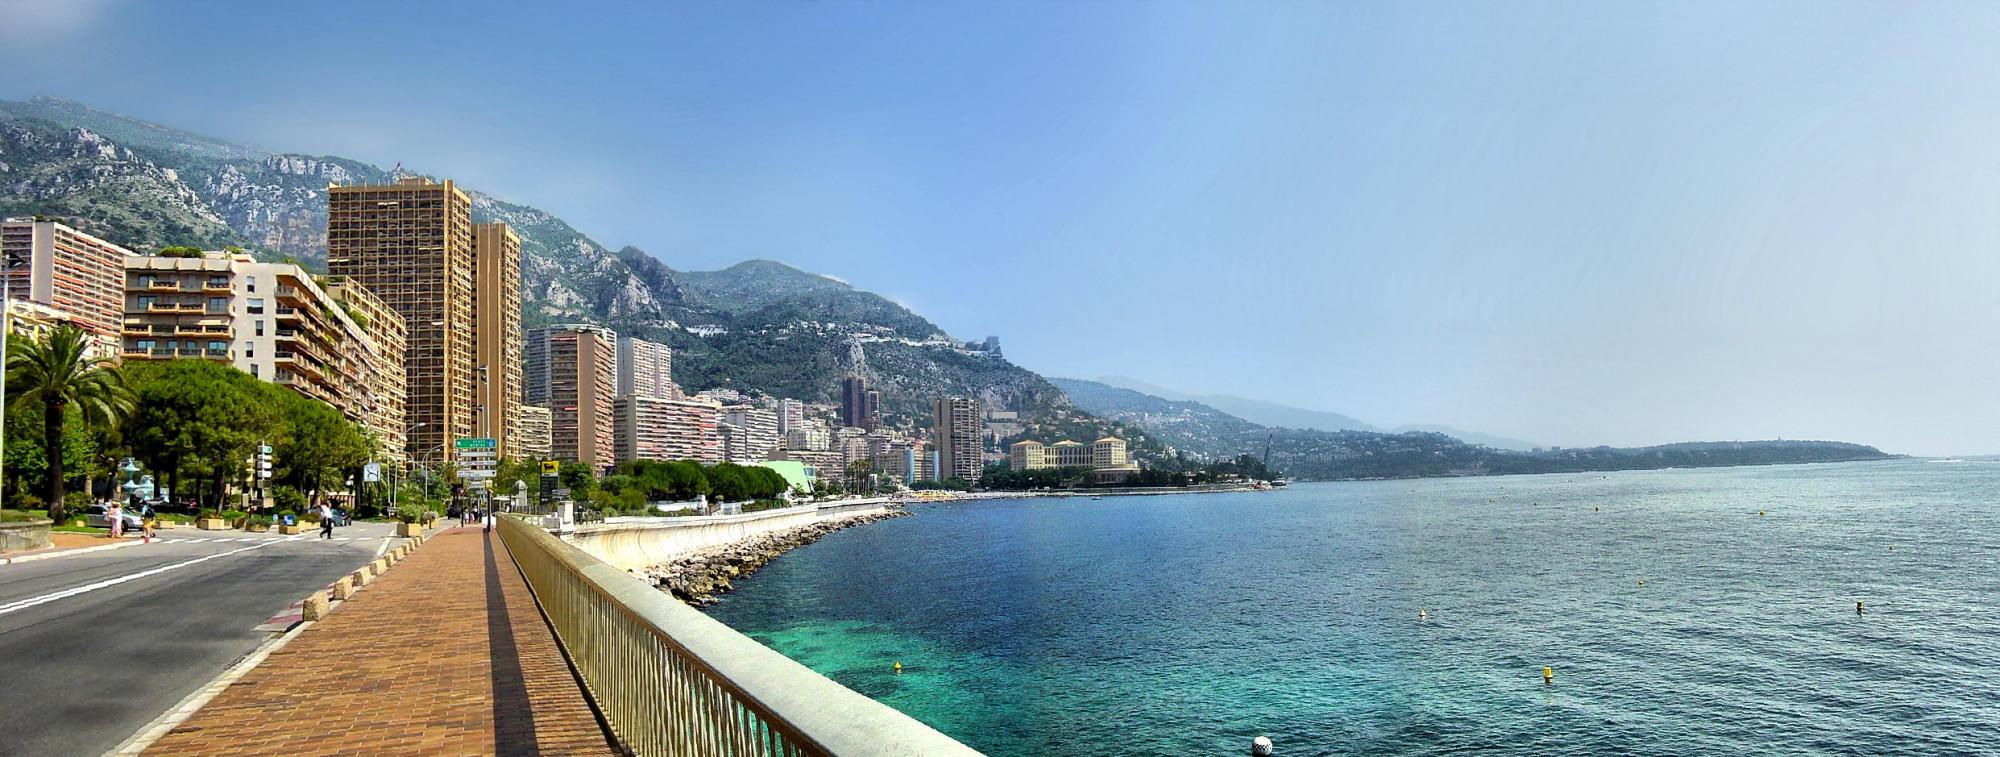 Monaco by LaNii